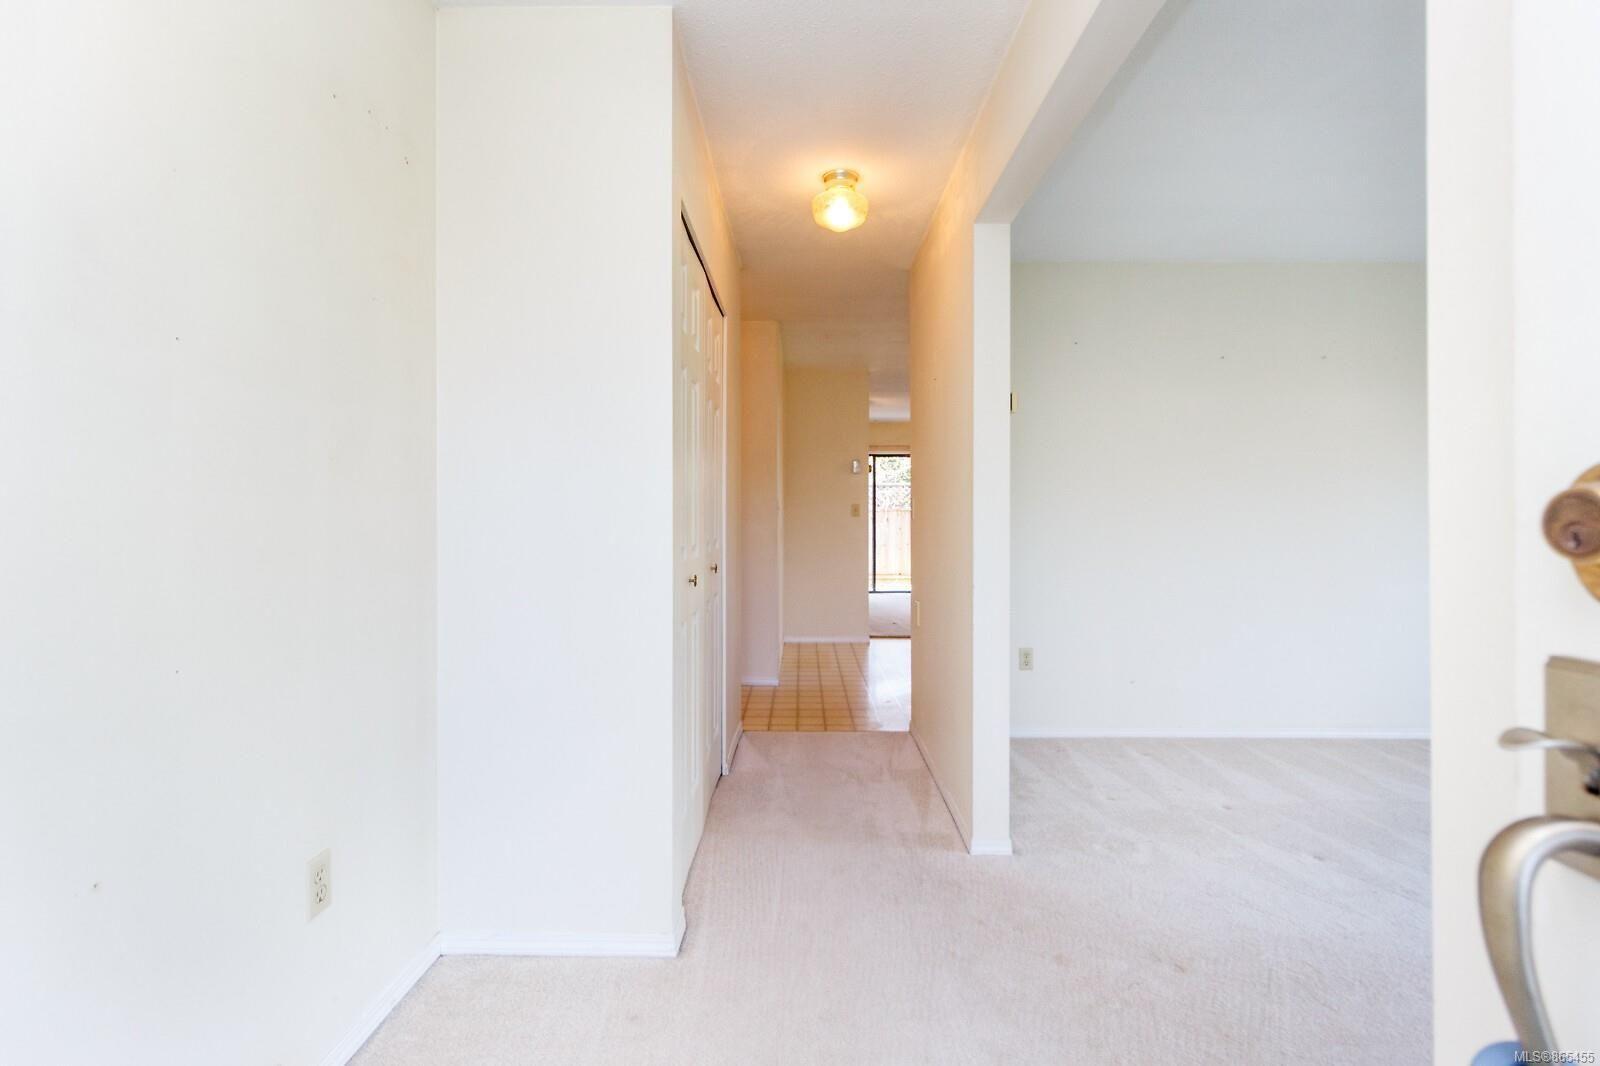 Photo 4: Photos: 399 Beech Ave in : Du East Duncan House for sale (Duncan)  : MLS®# 865455